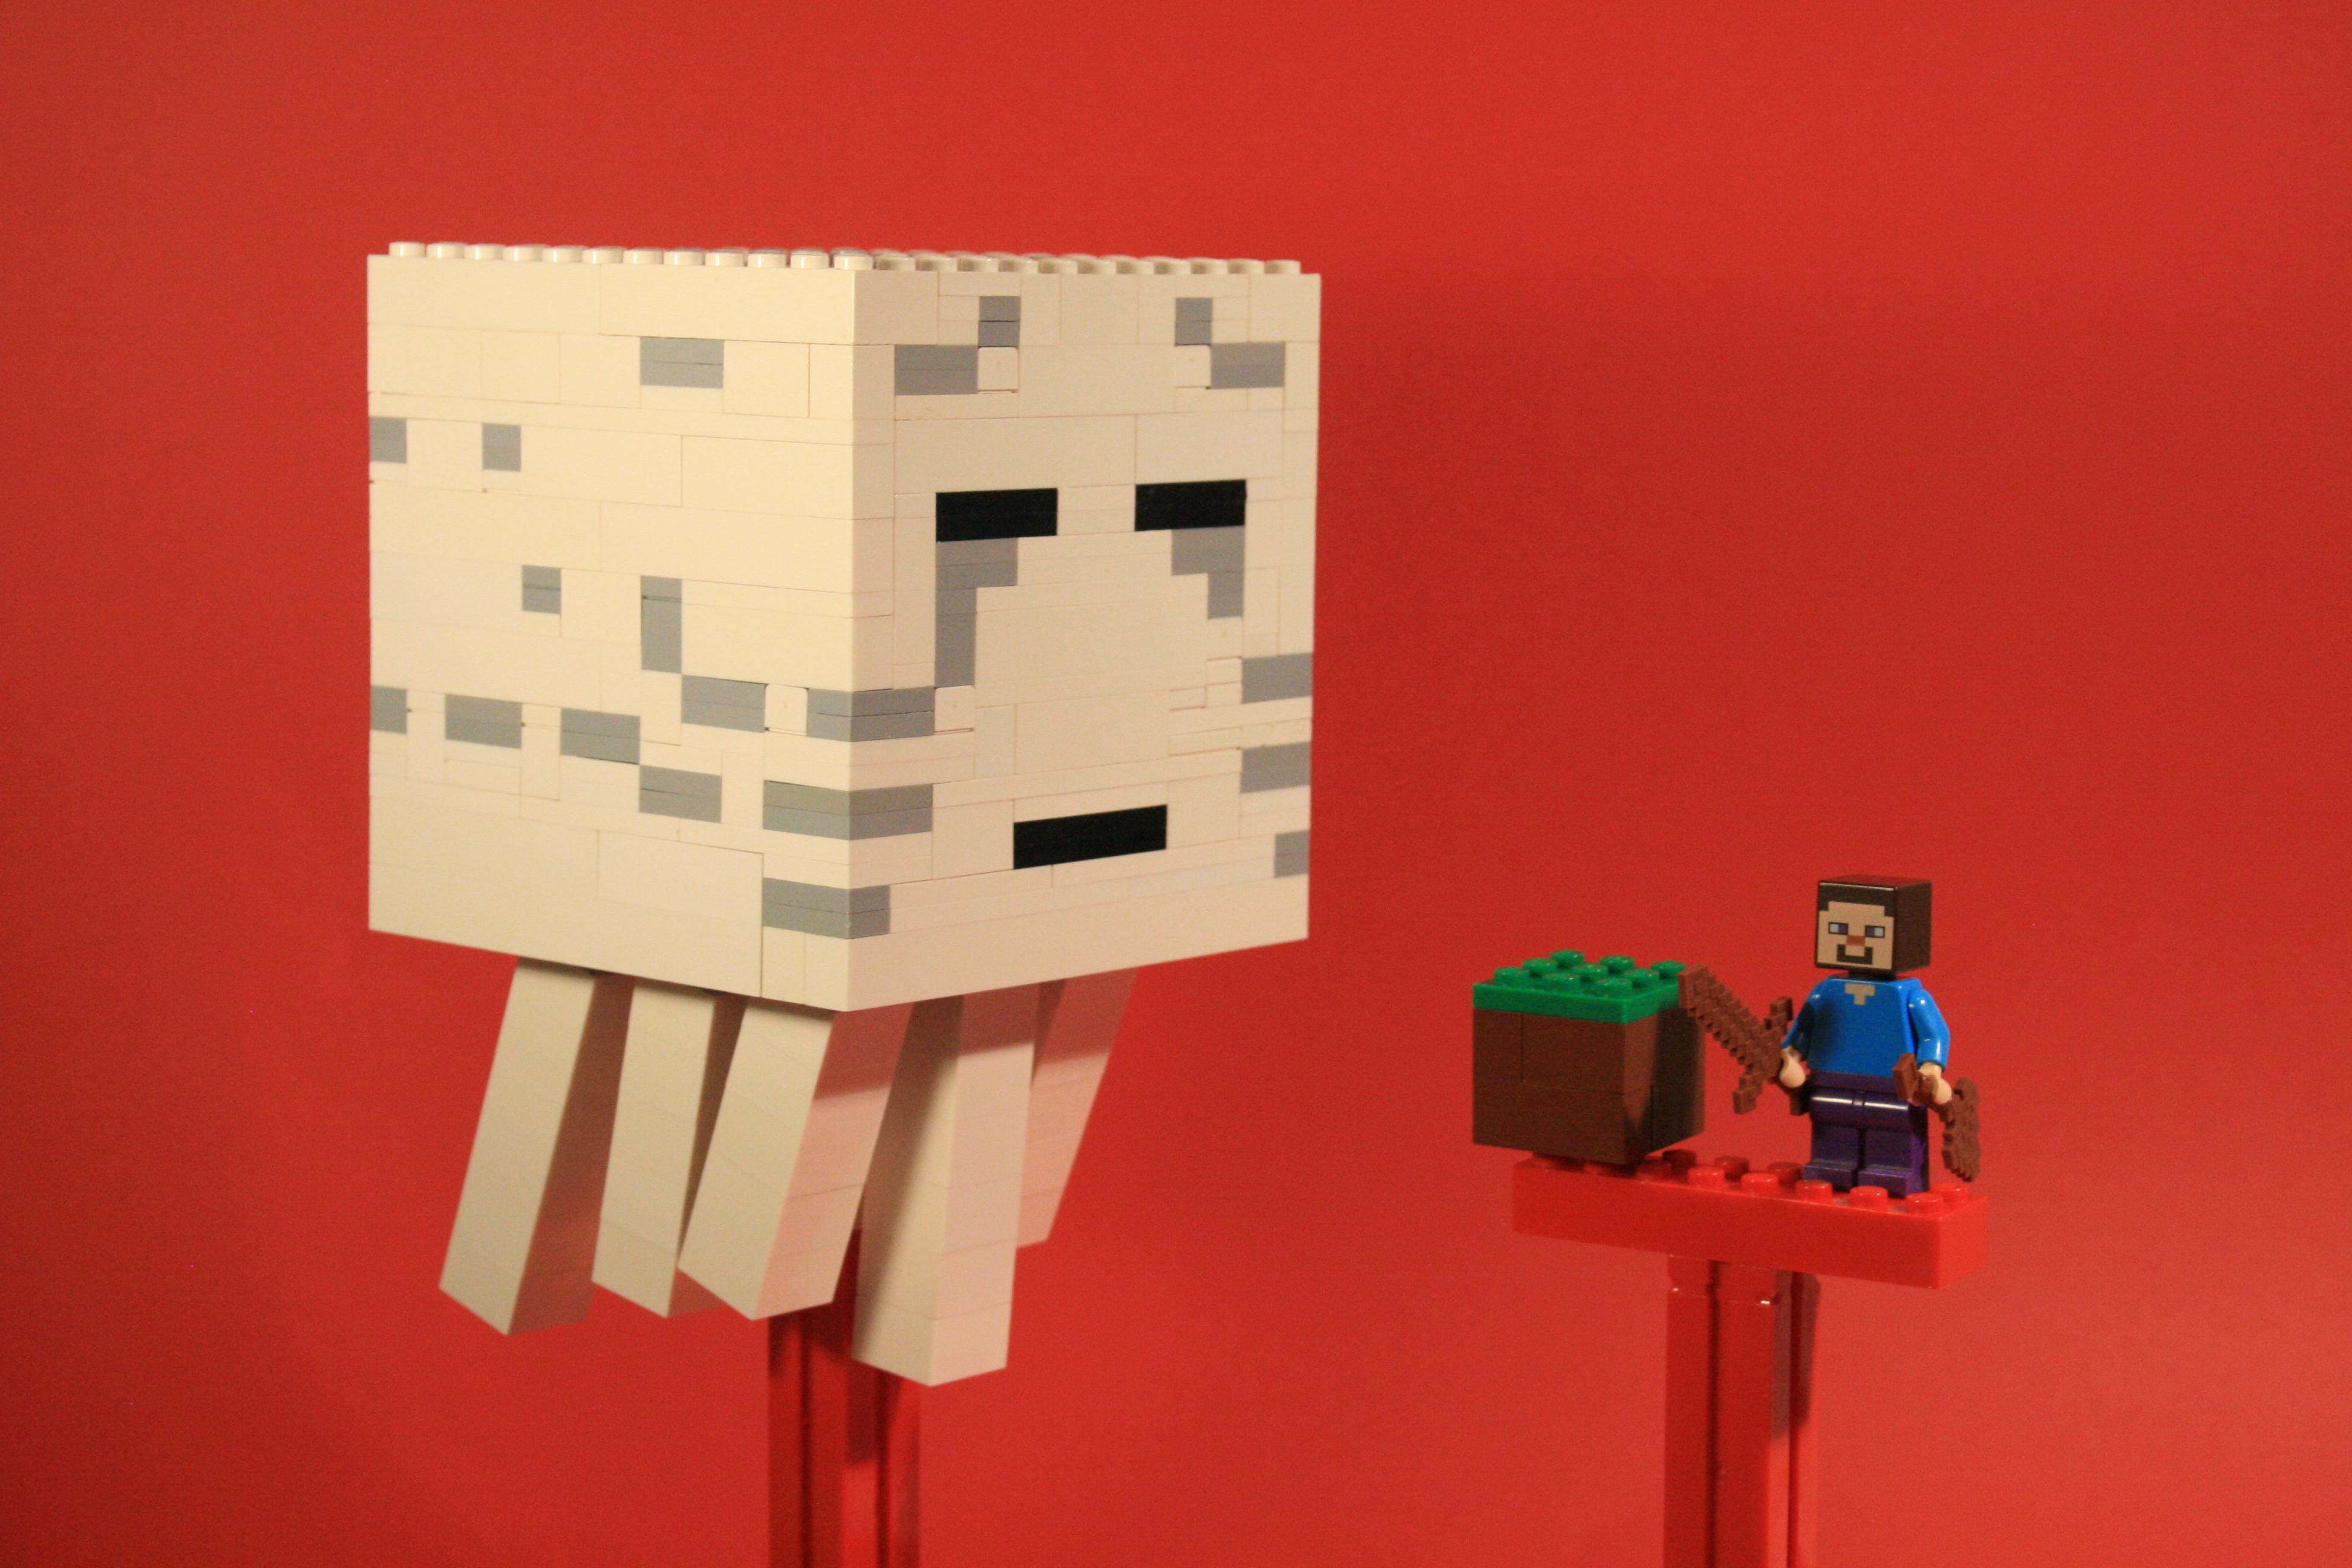 Hintergrundbilder : Illustration, rot, Minecraft, LEGO, Computer ...